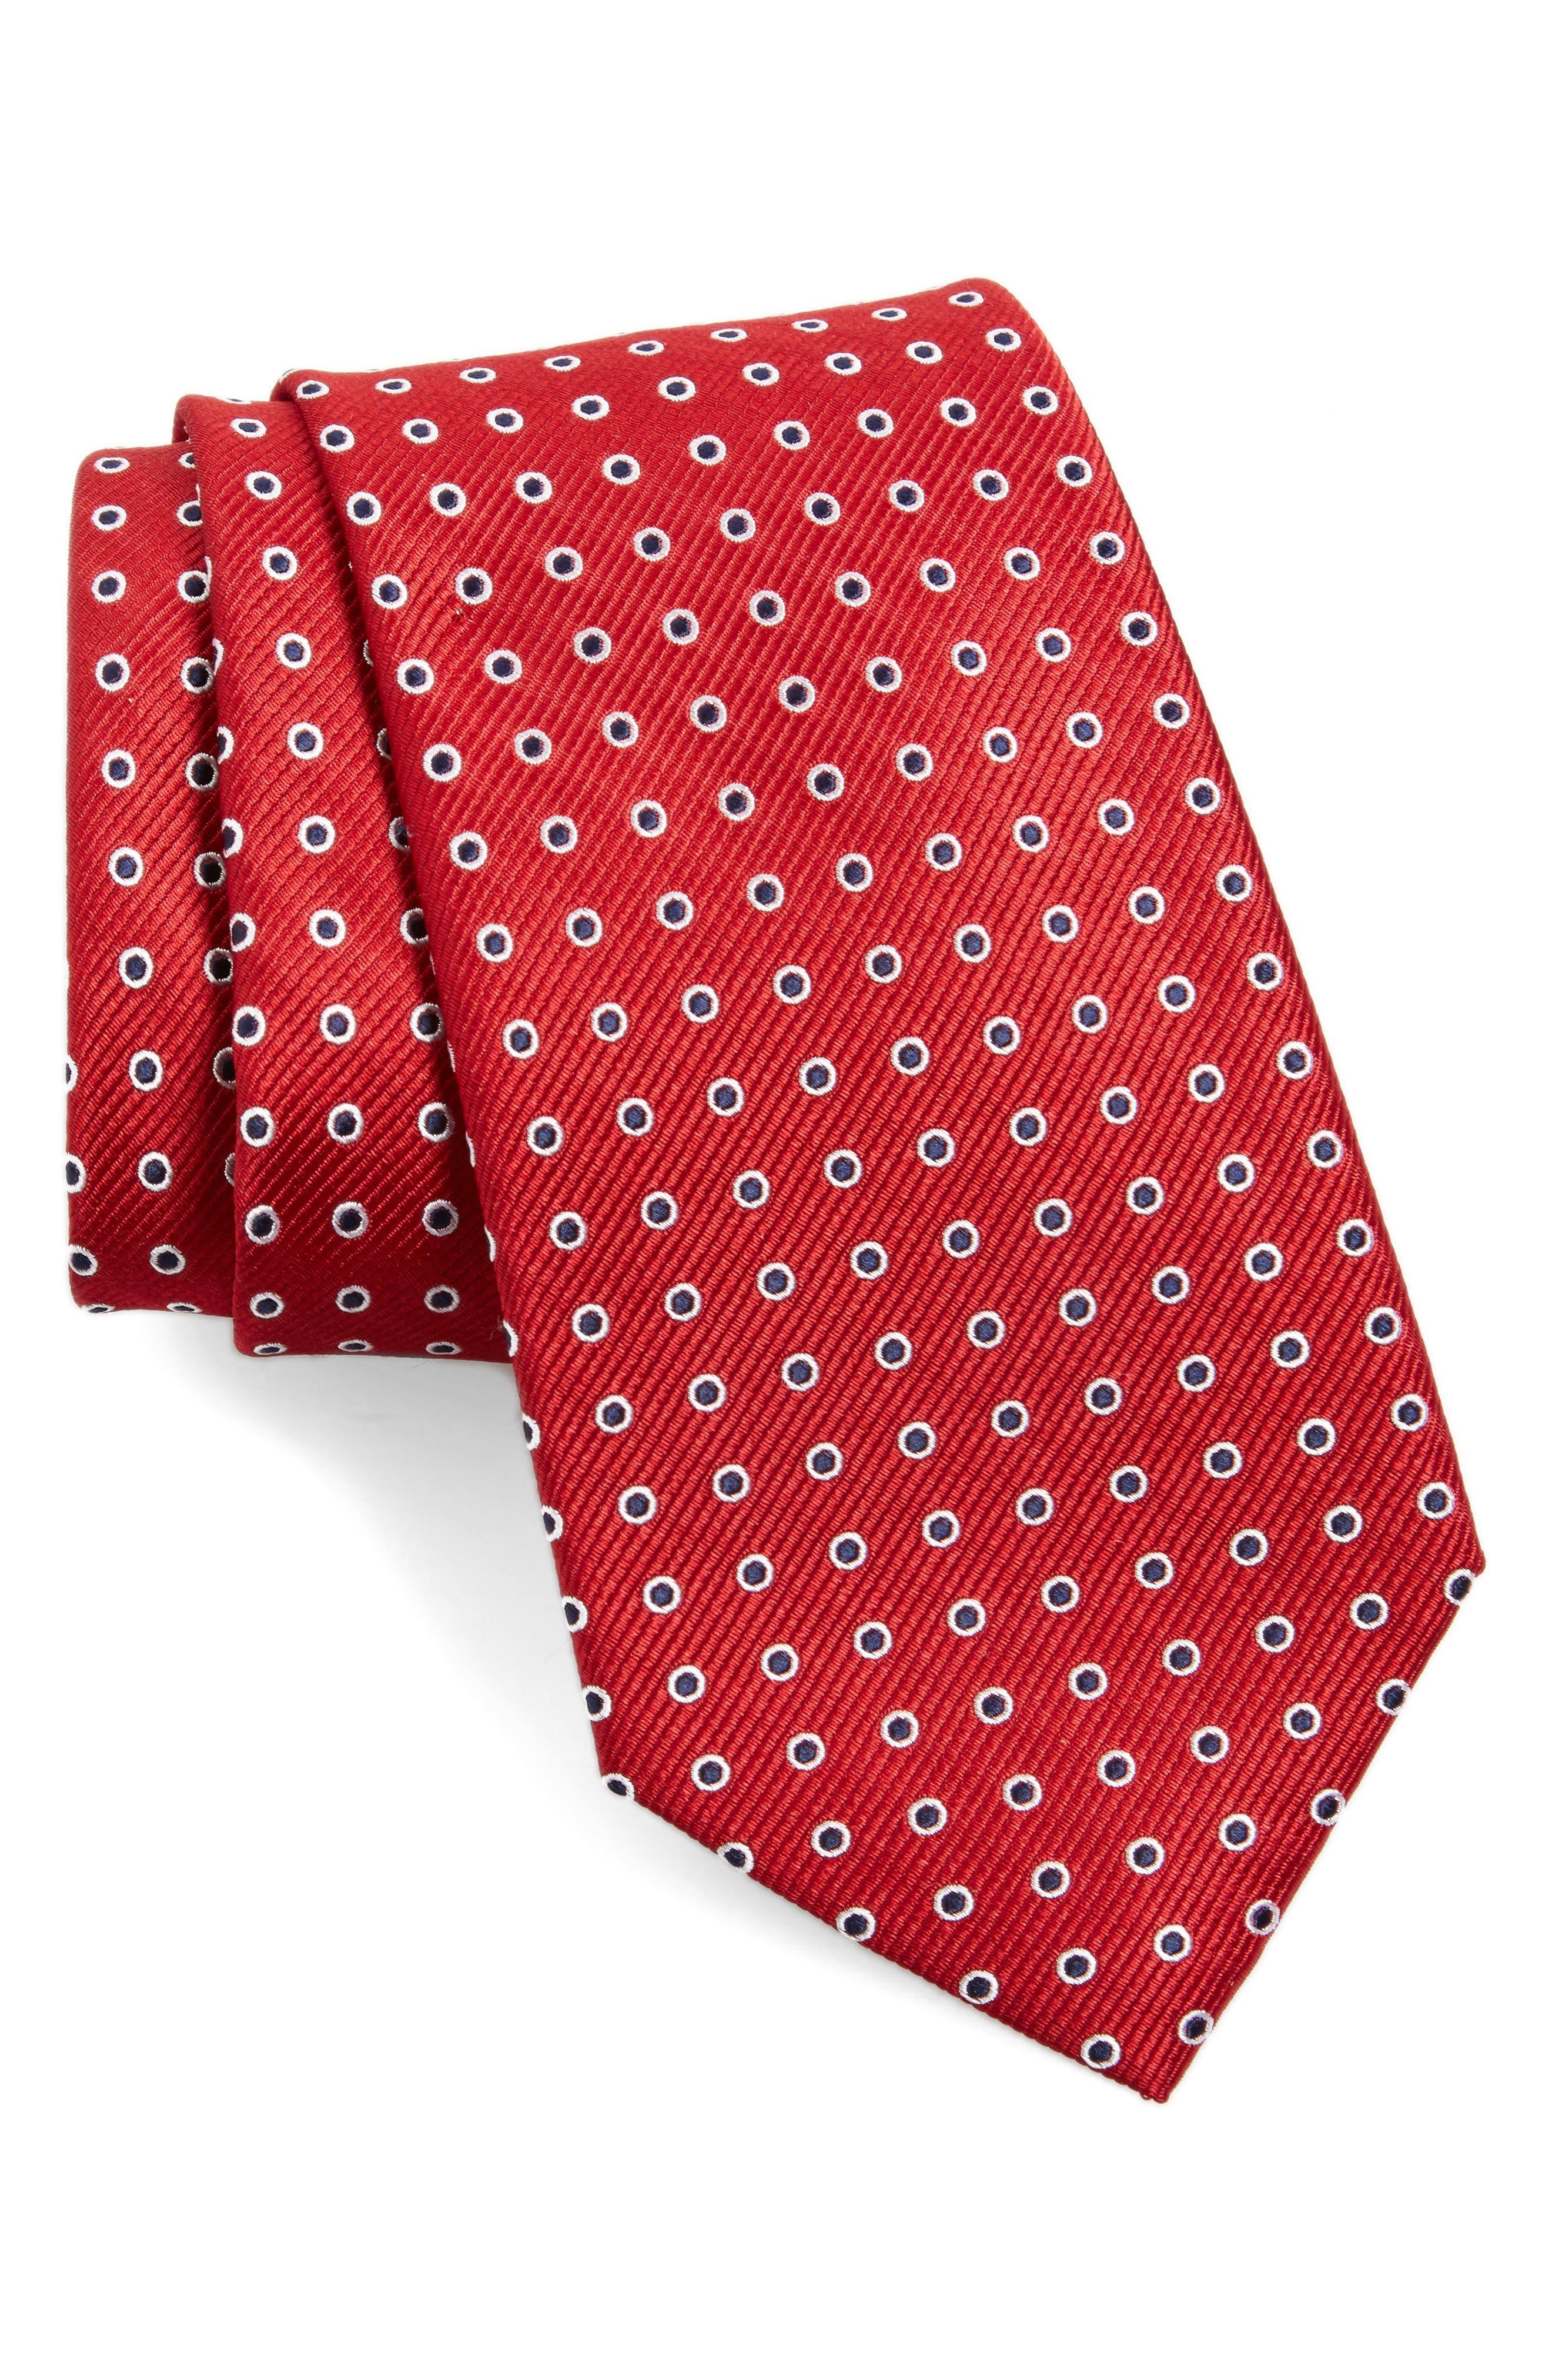 Nordstrom Men's Shop Halo Dot Silk Tie